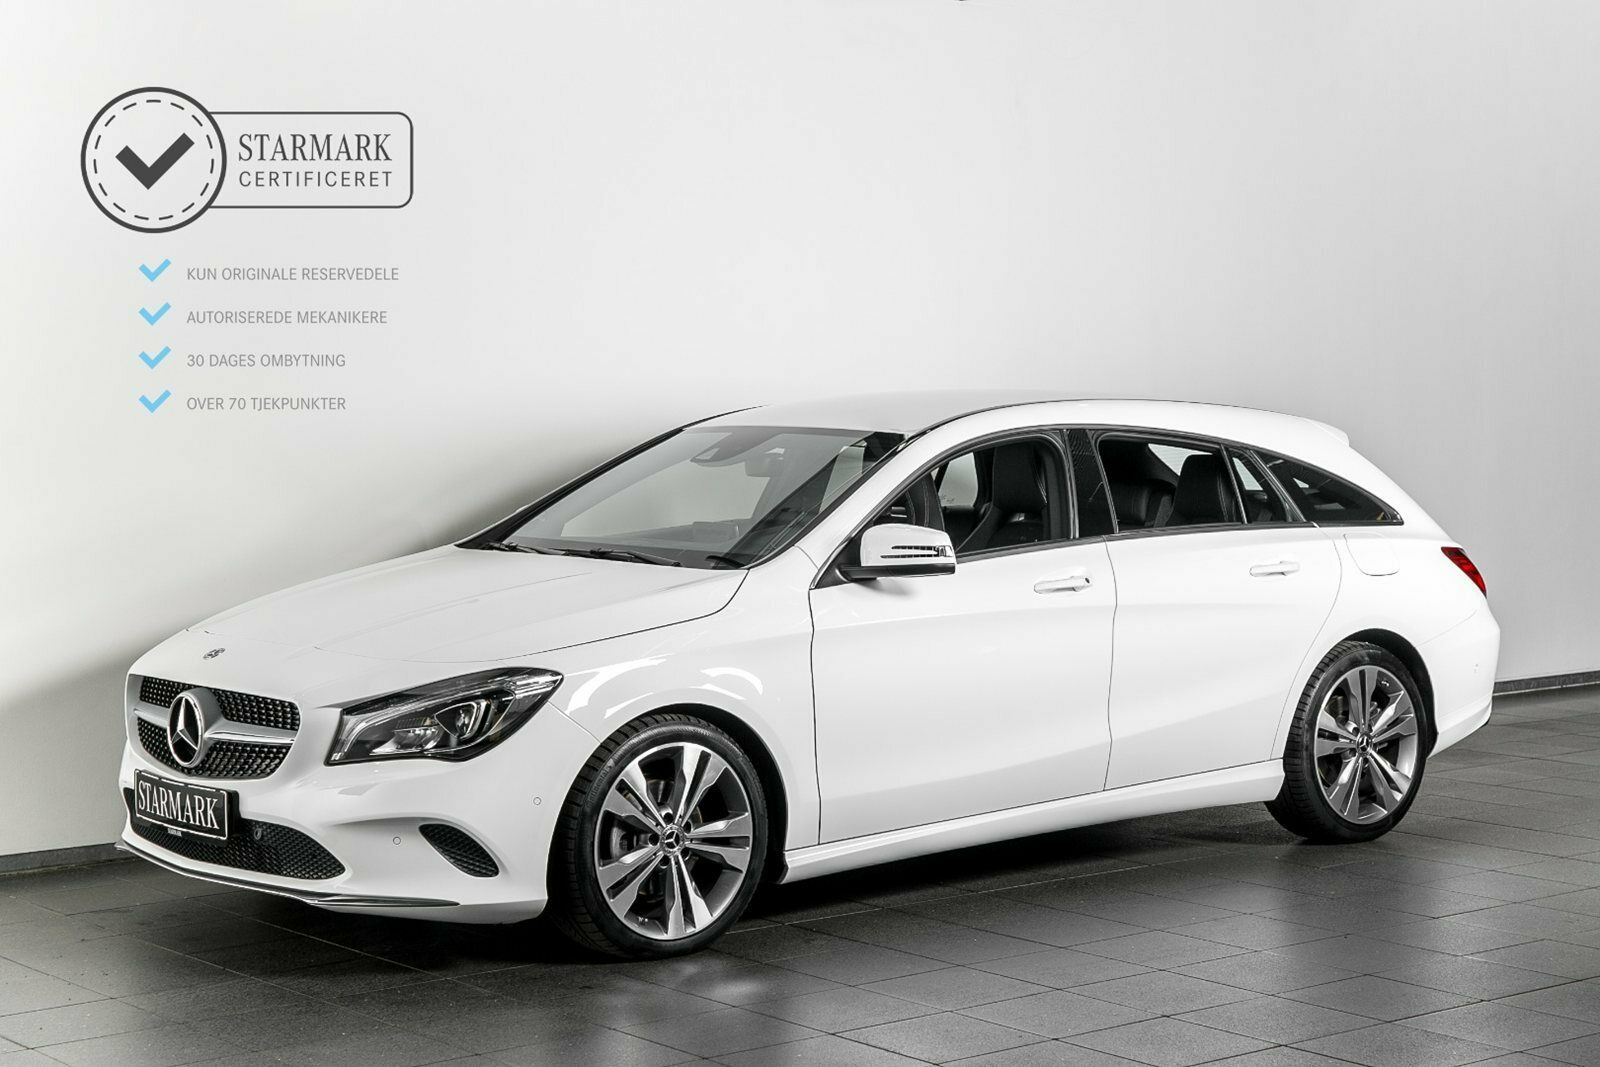 Mercedes CLA200 d 2,2 SB aut. 5d - 369.900 kr.